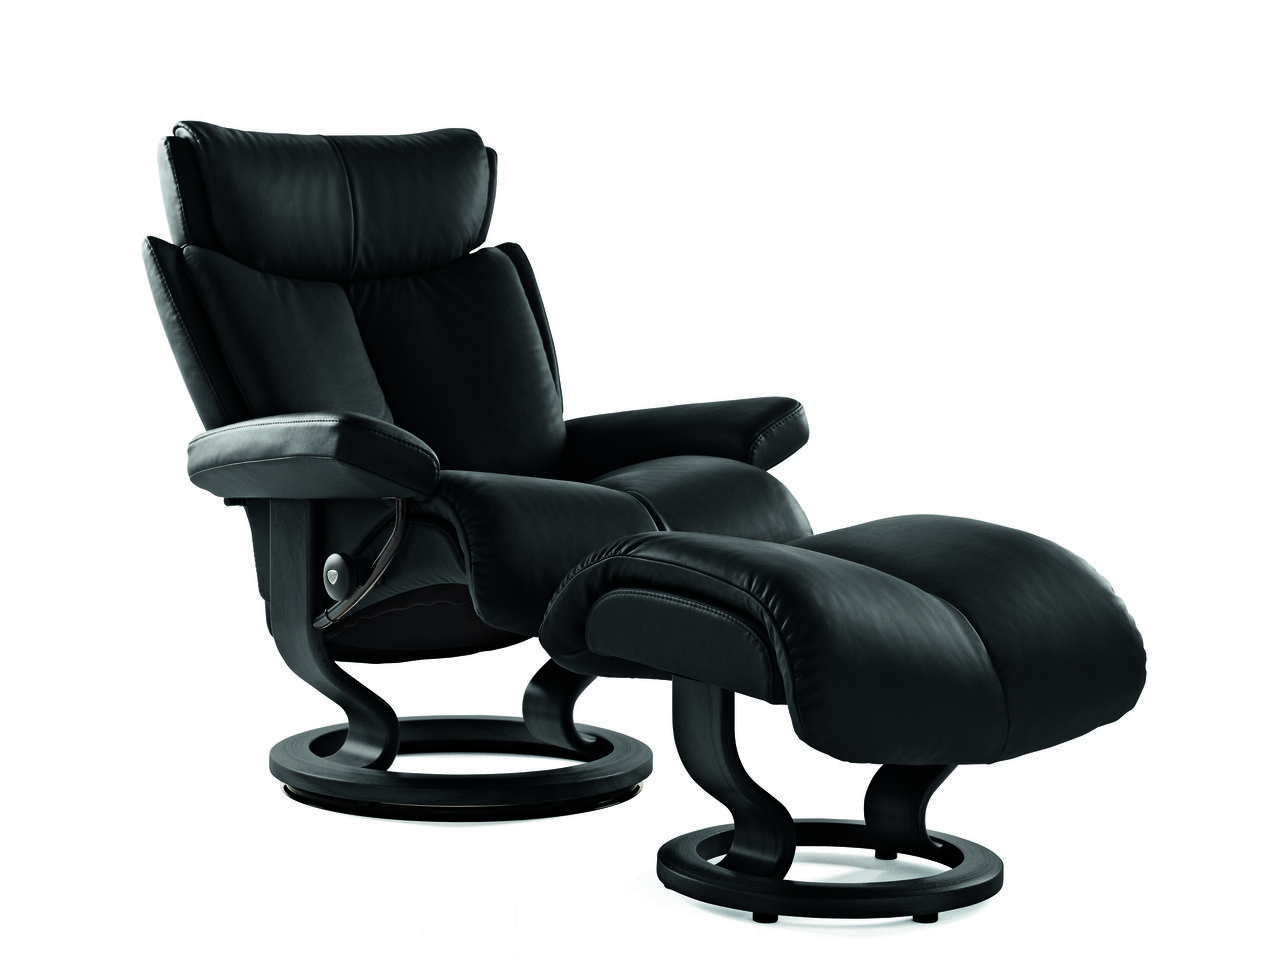 Ekornes Stressless Magic Recliner Small Stress Free Delivery Stressless Recliner Ekornes Stressless Chair